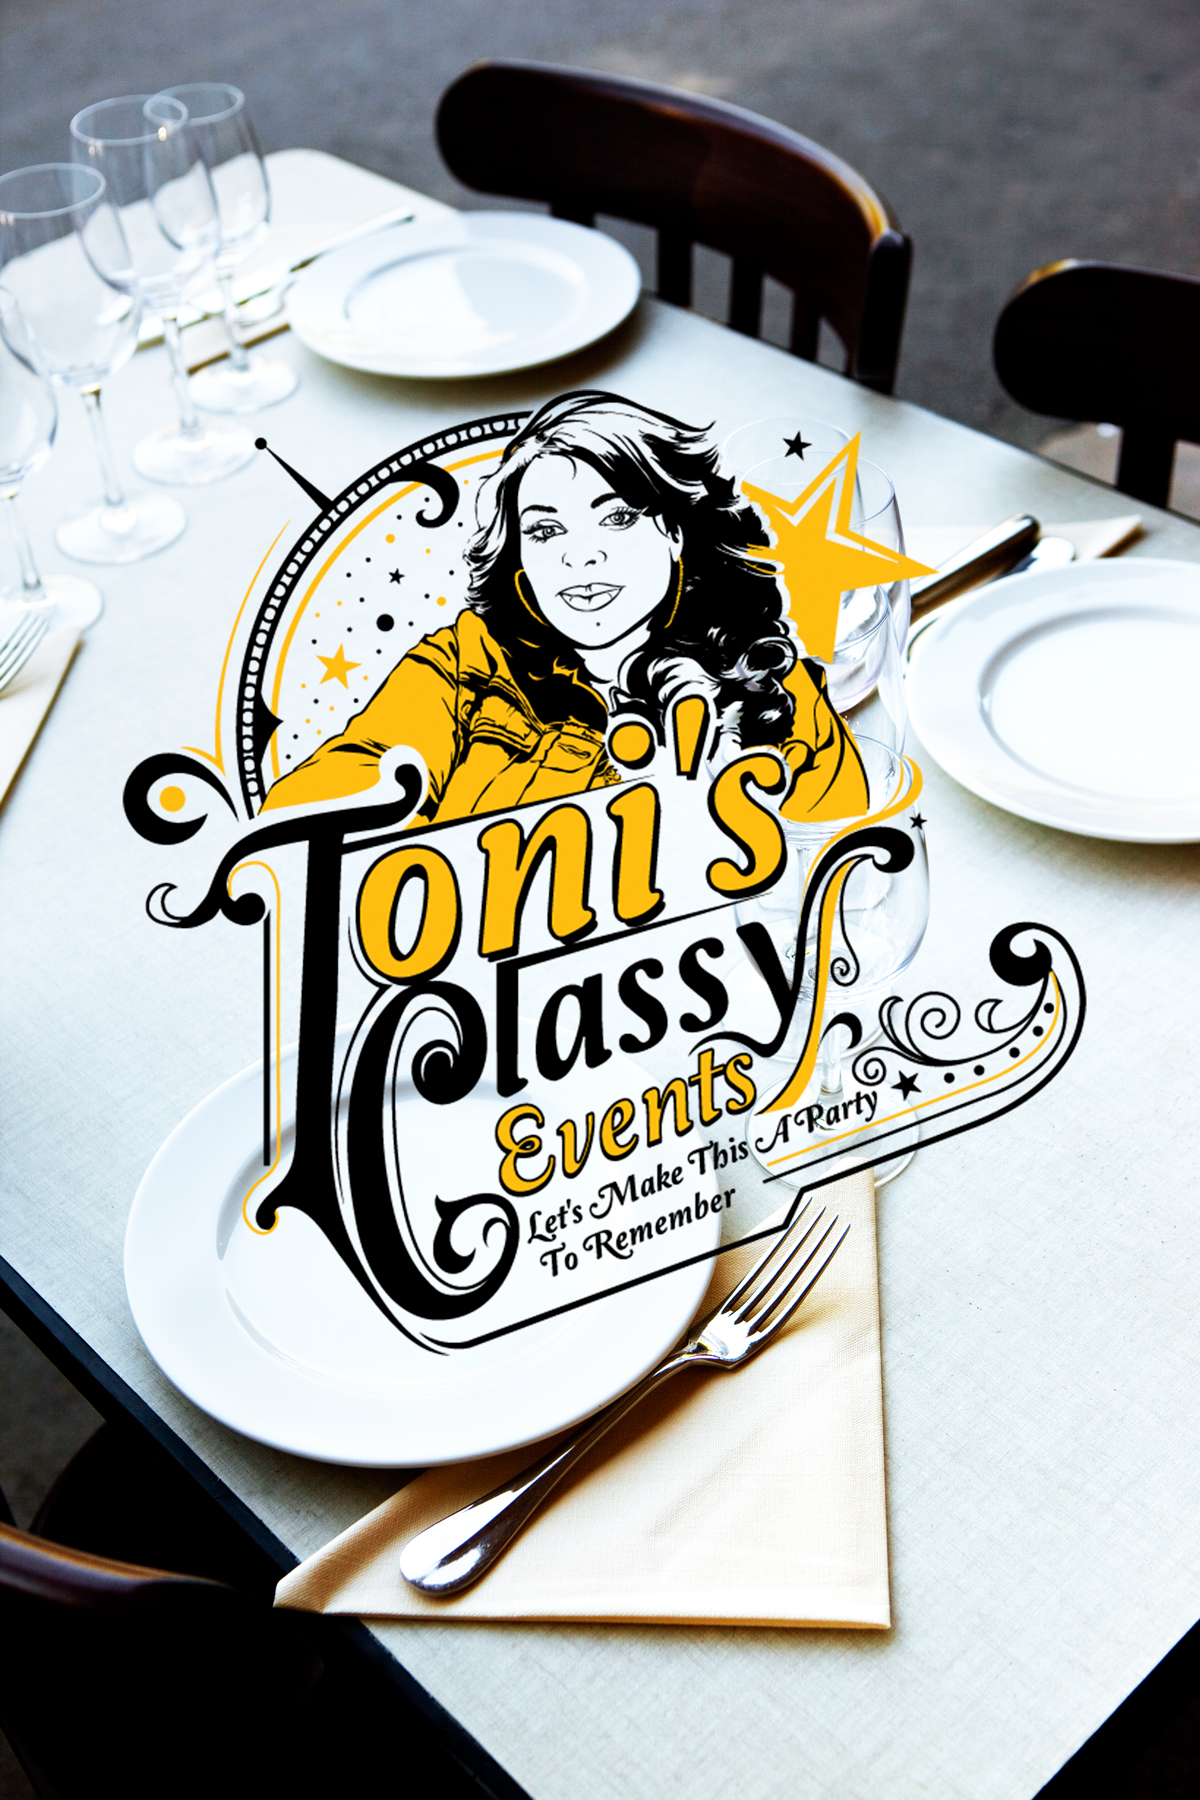 Toni's Classy Events Logo